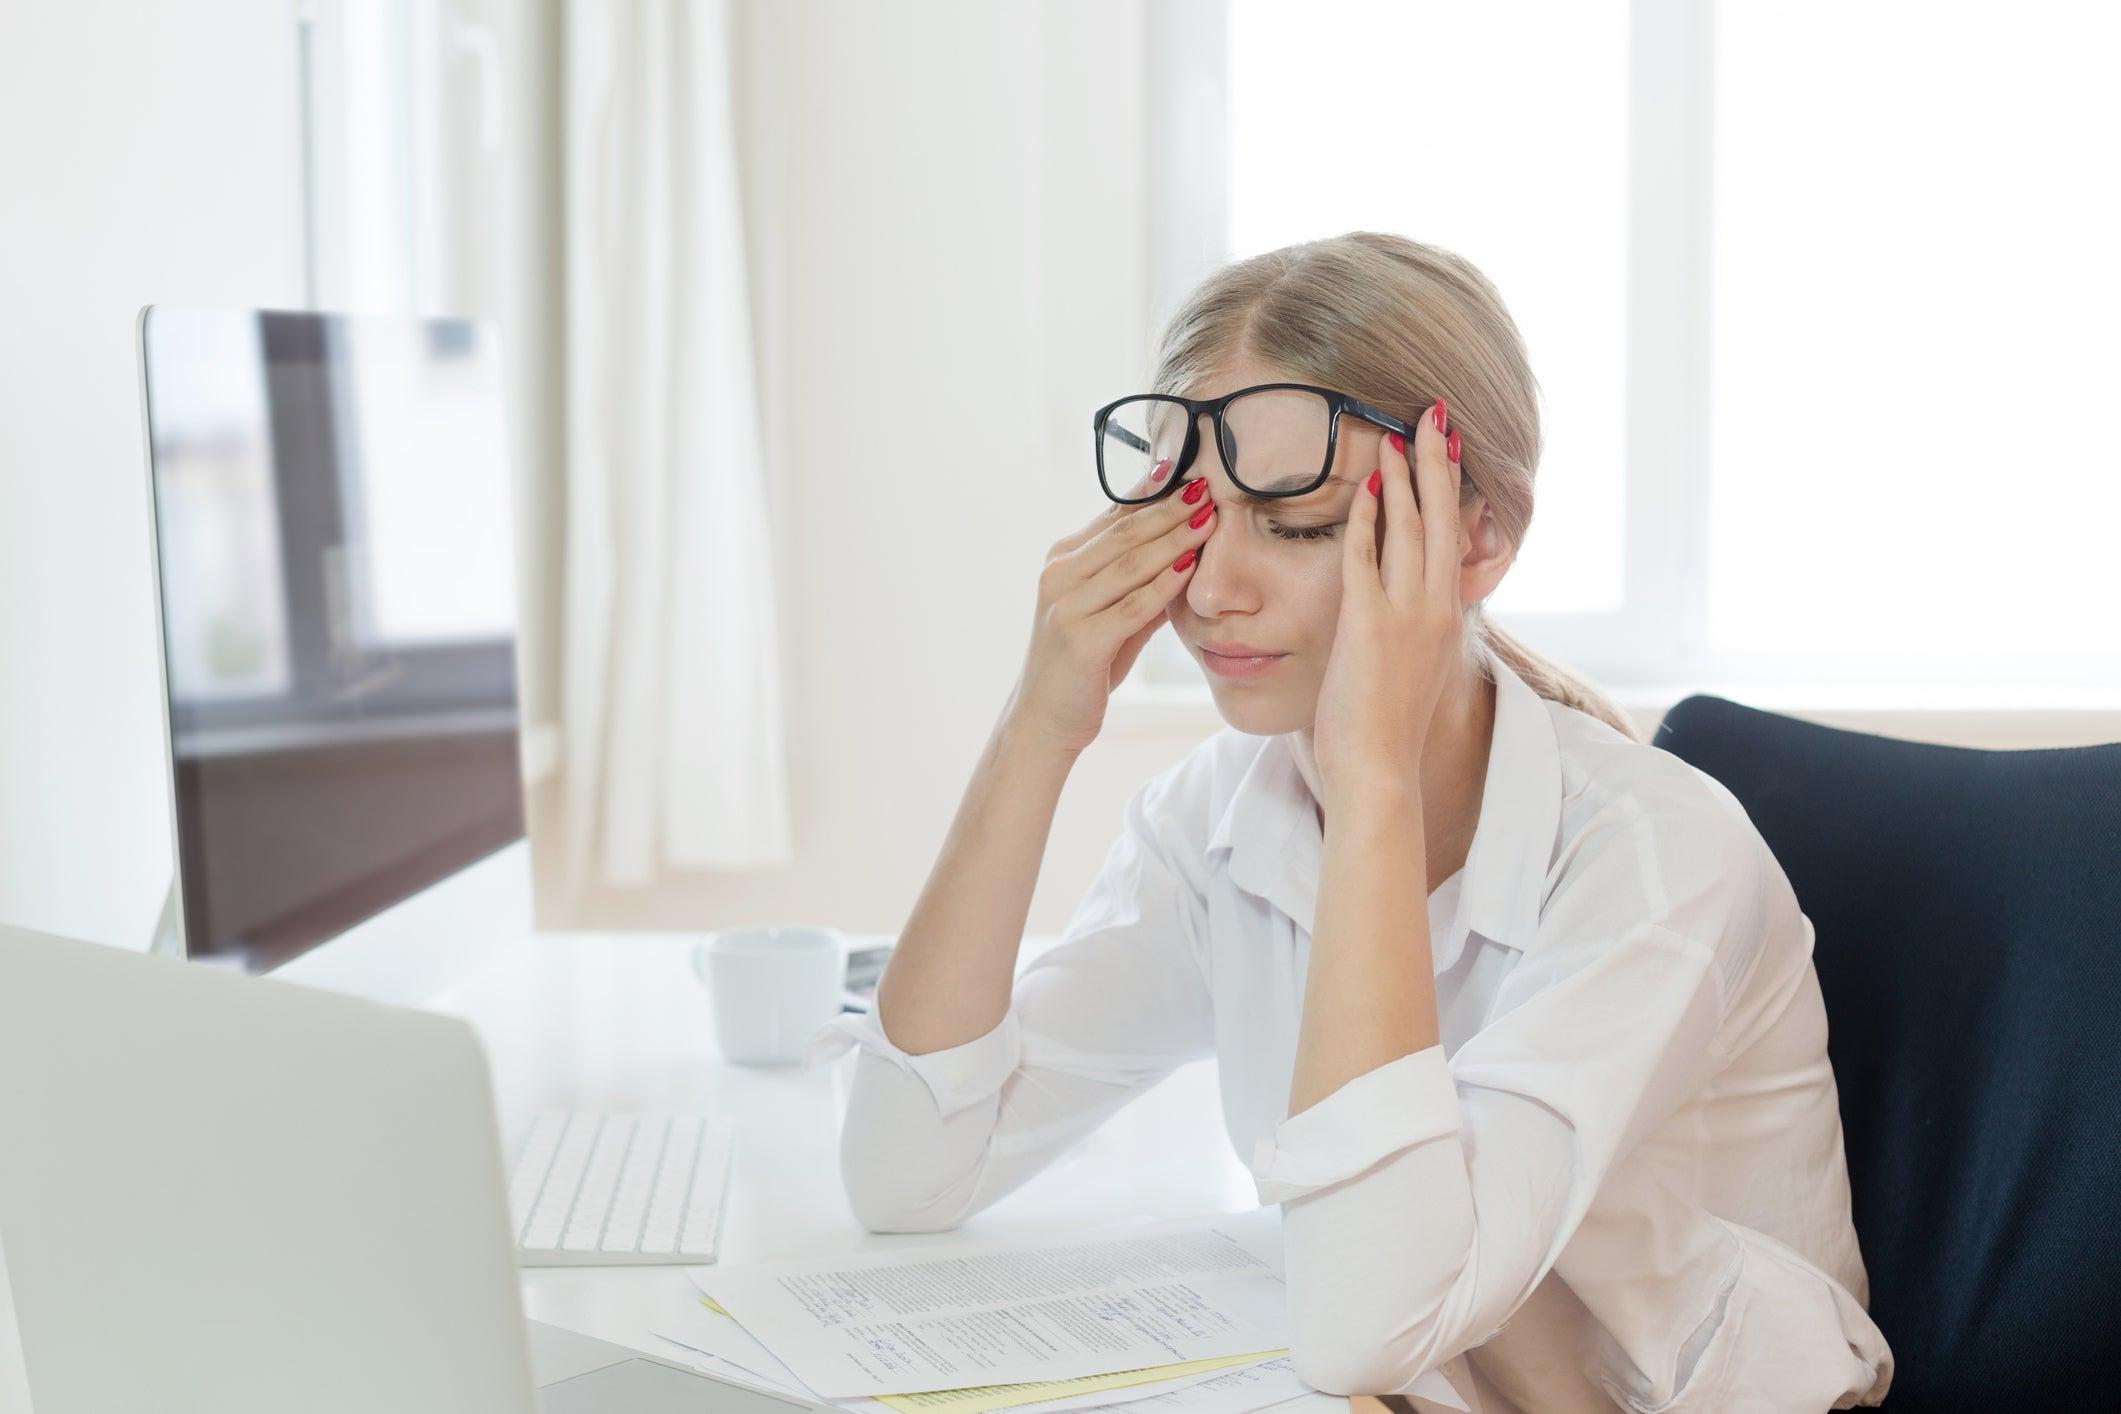 Tired woman rubbing eyes